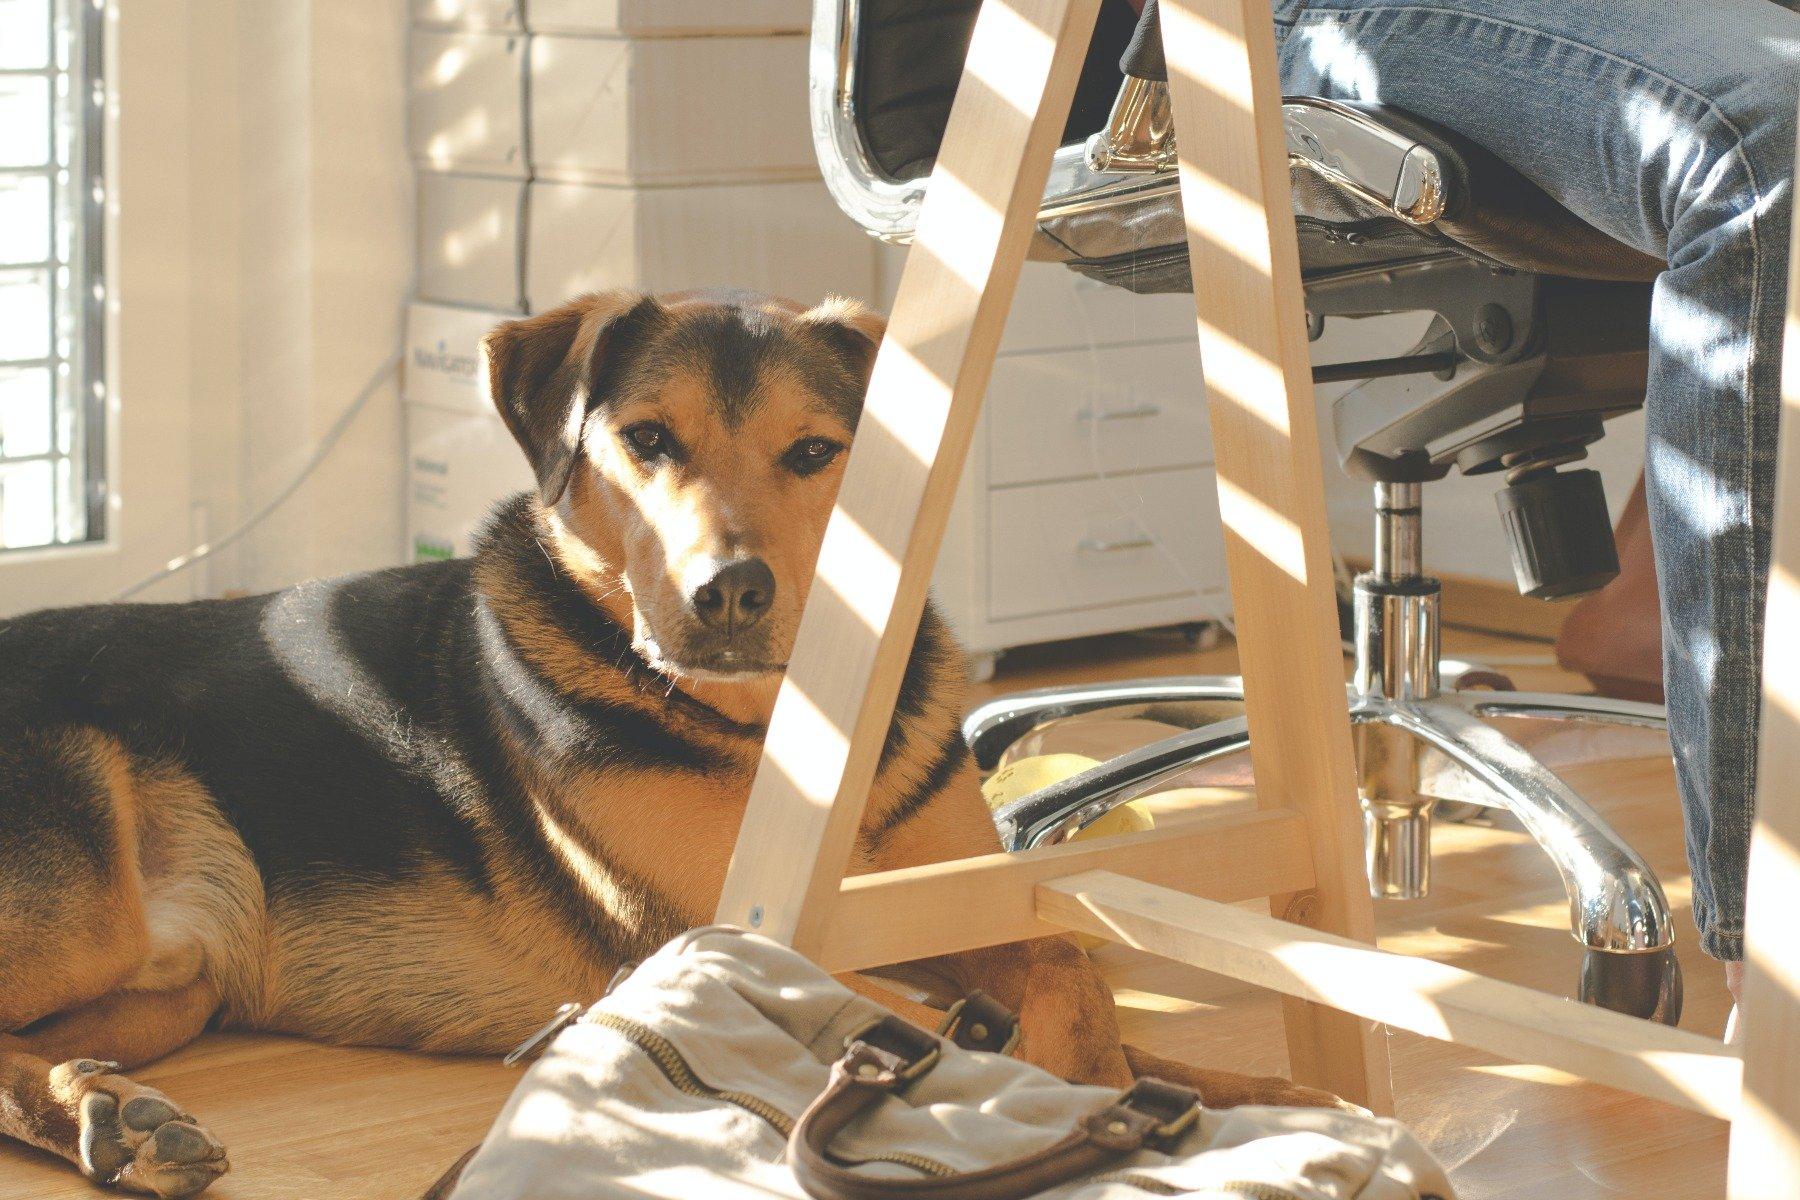 Hund liegt am Arbeitsplatz